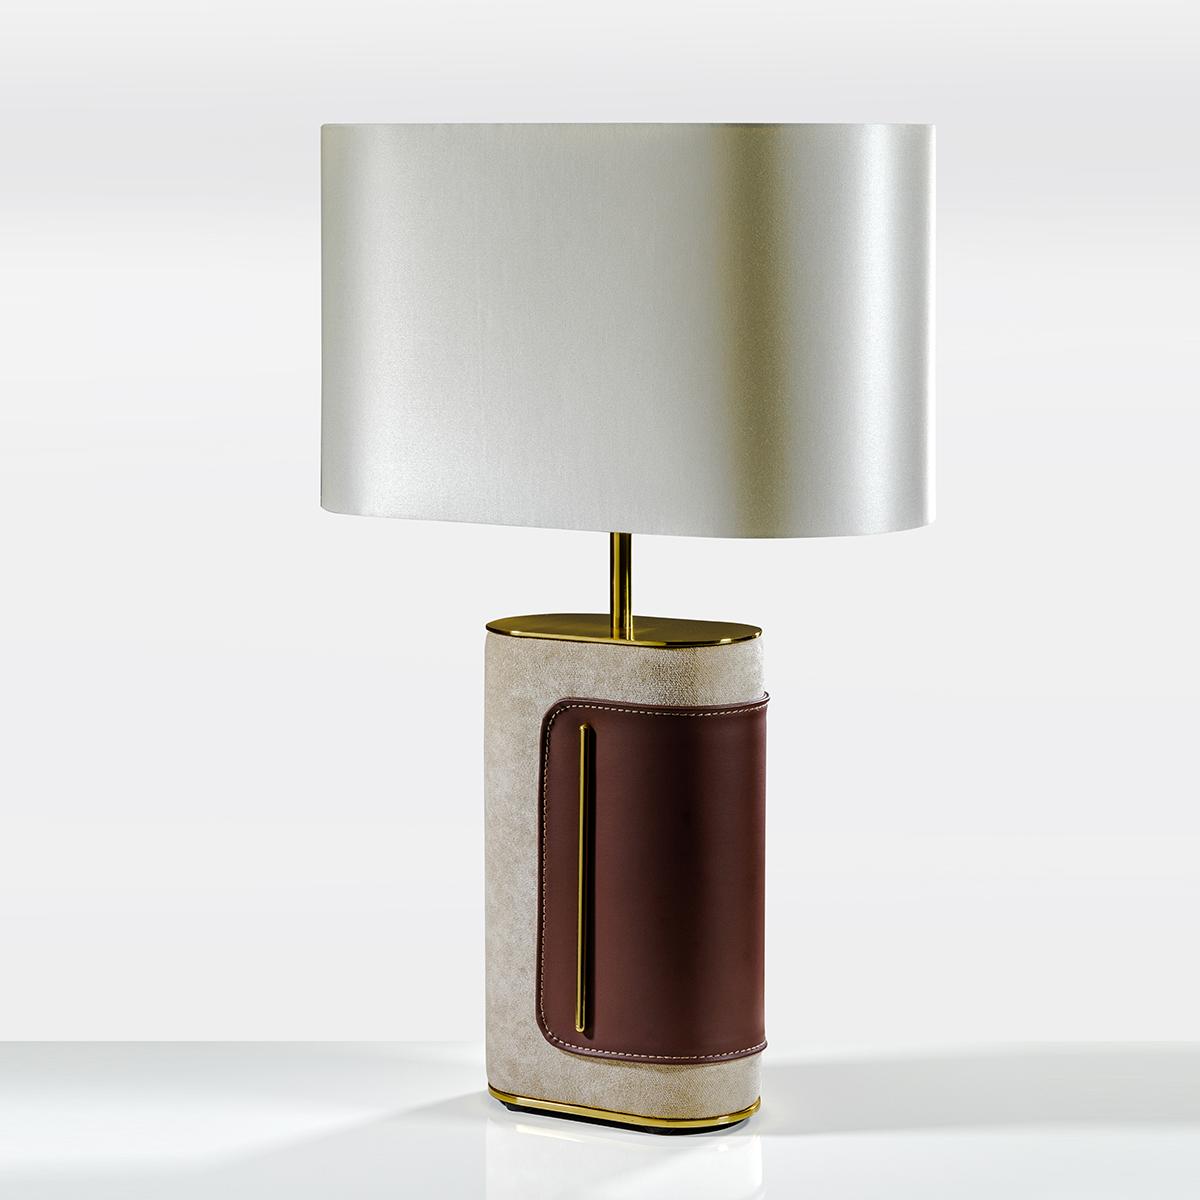 sella Sella Table lamp colunex sella table lamp 01